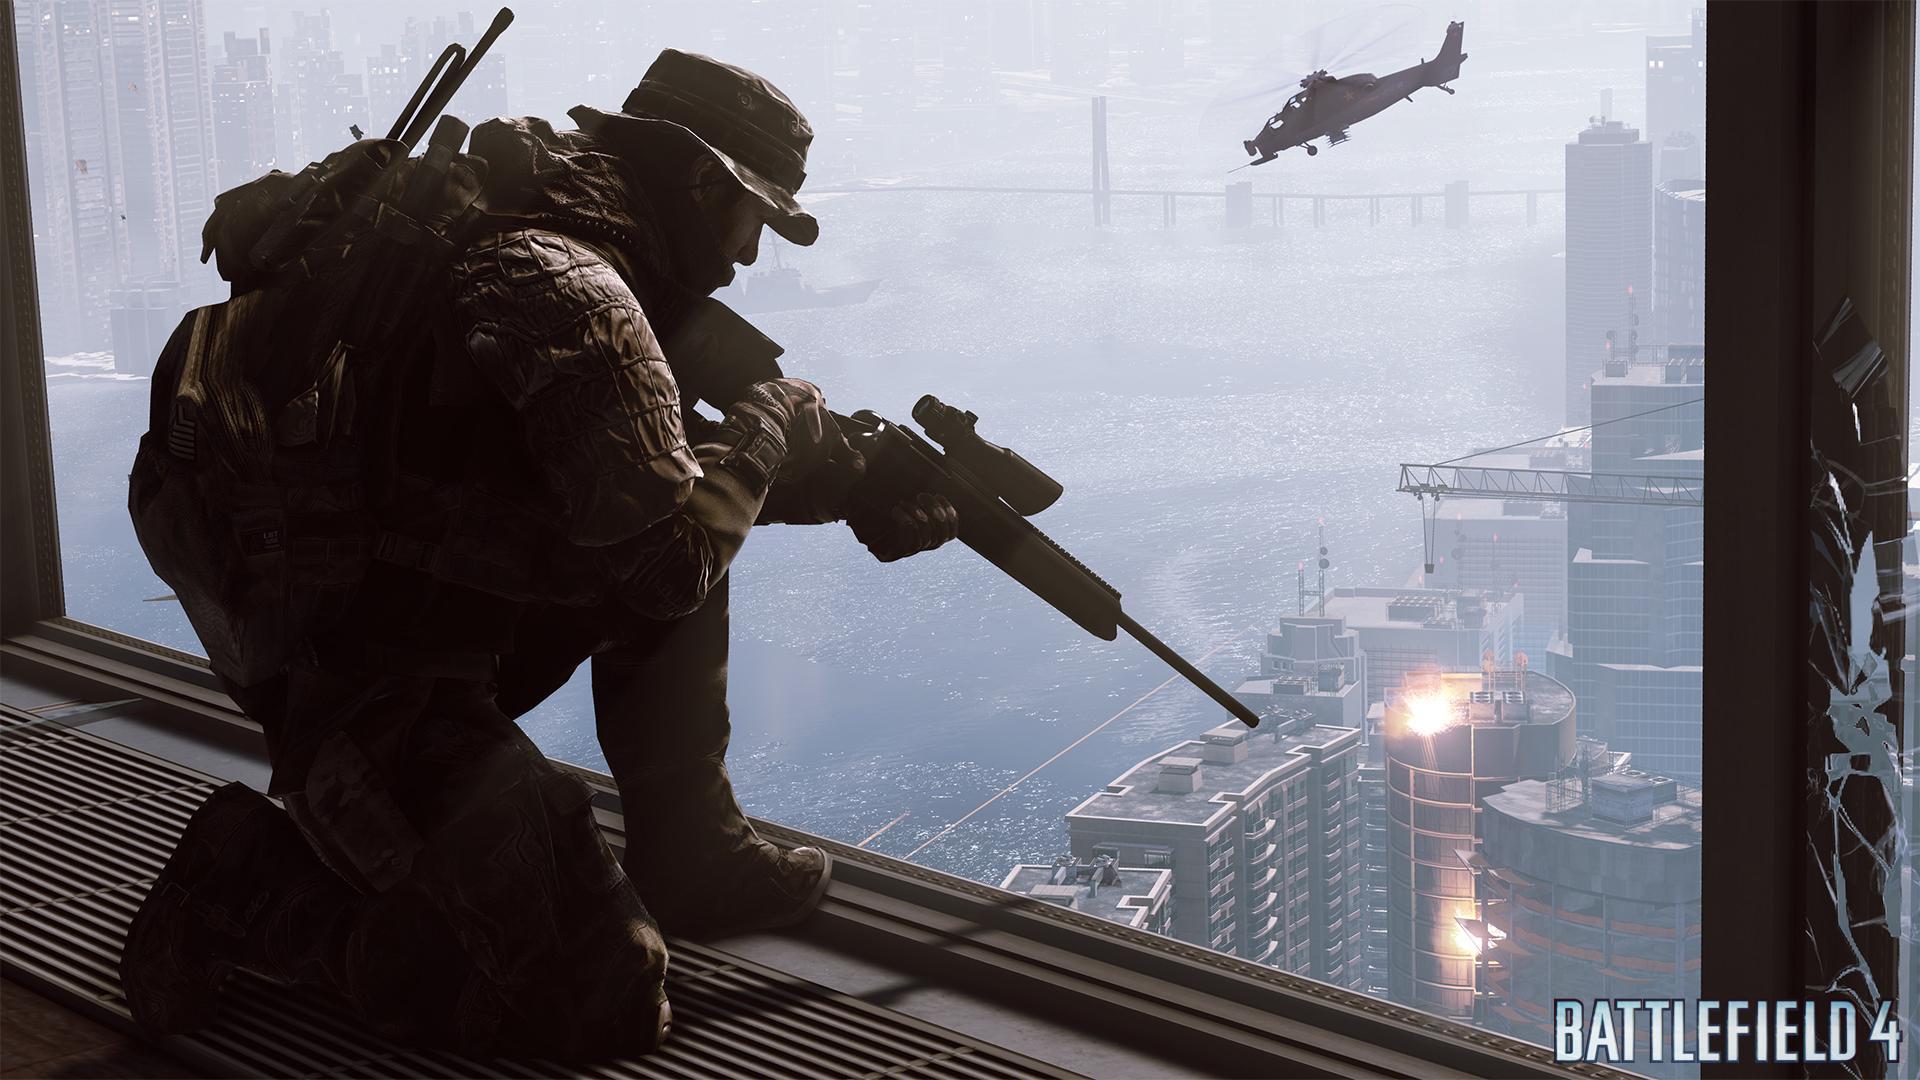 Battlefield 4 wallpaper 11